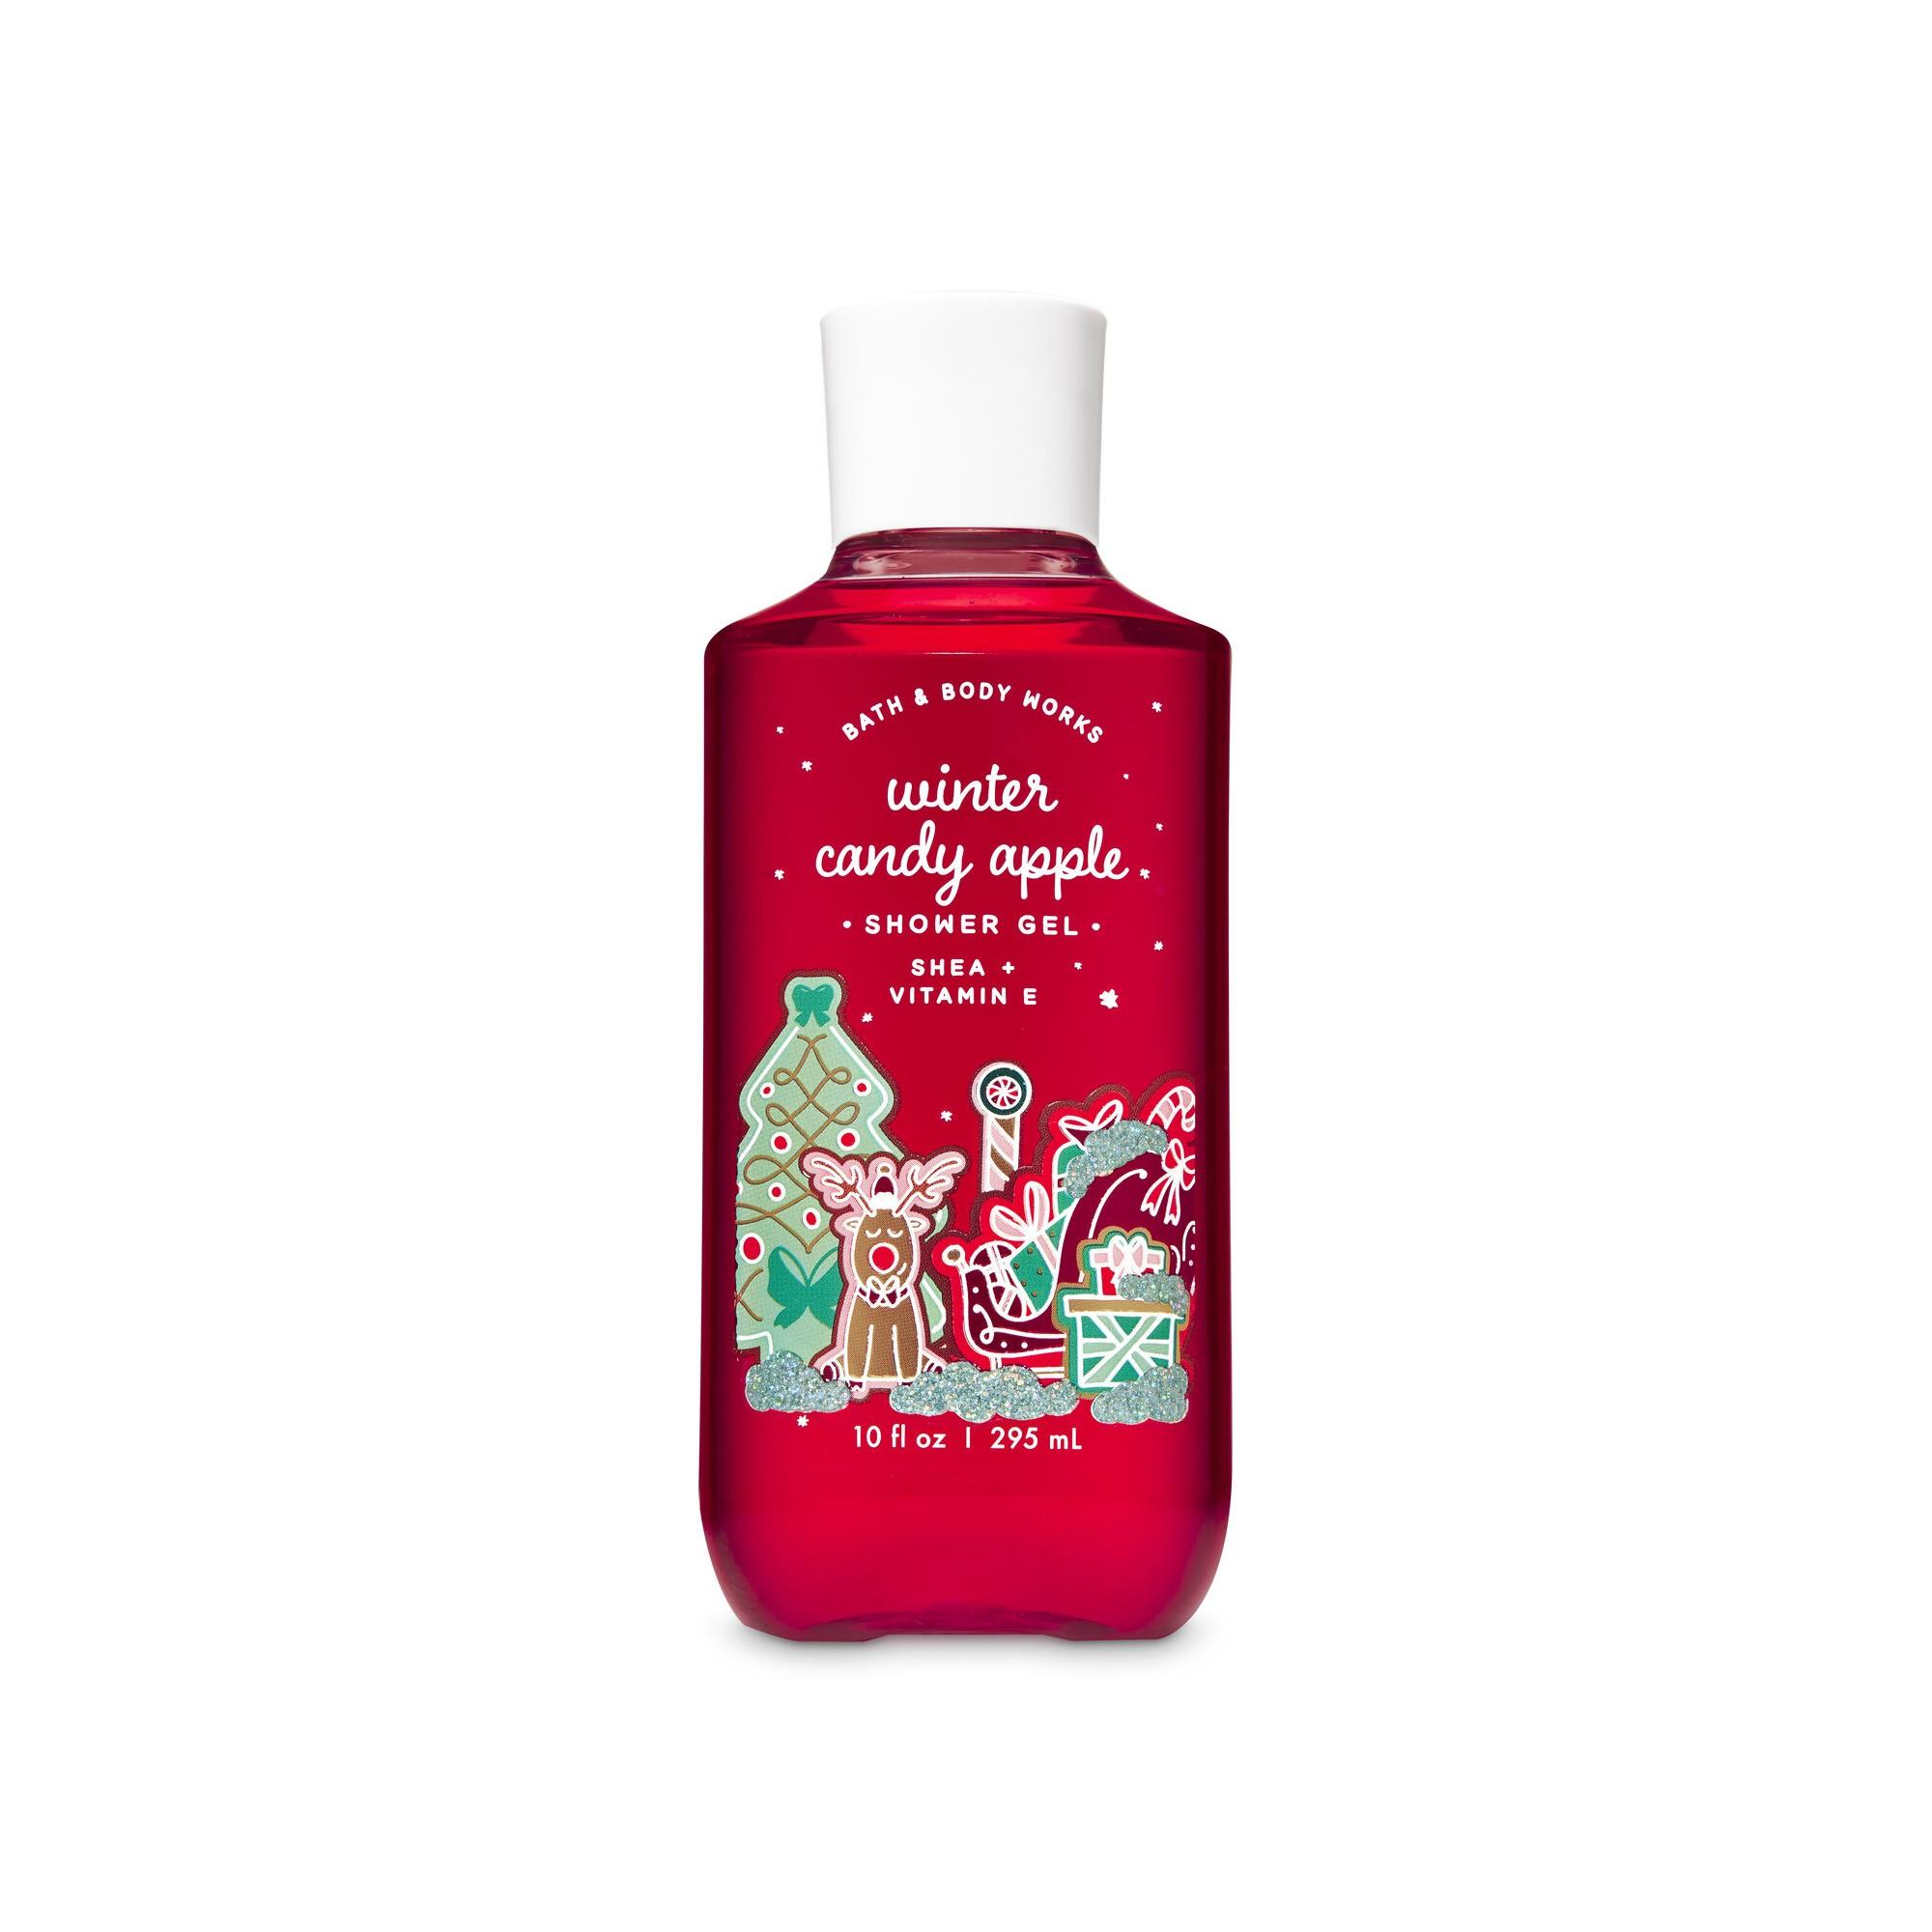 Bath & Body Works Winter Candy Apple Shower Gel